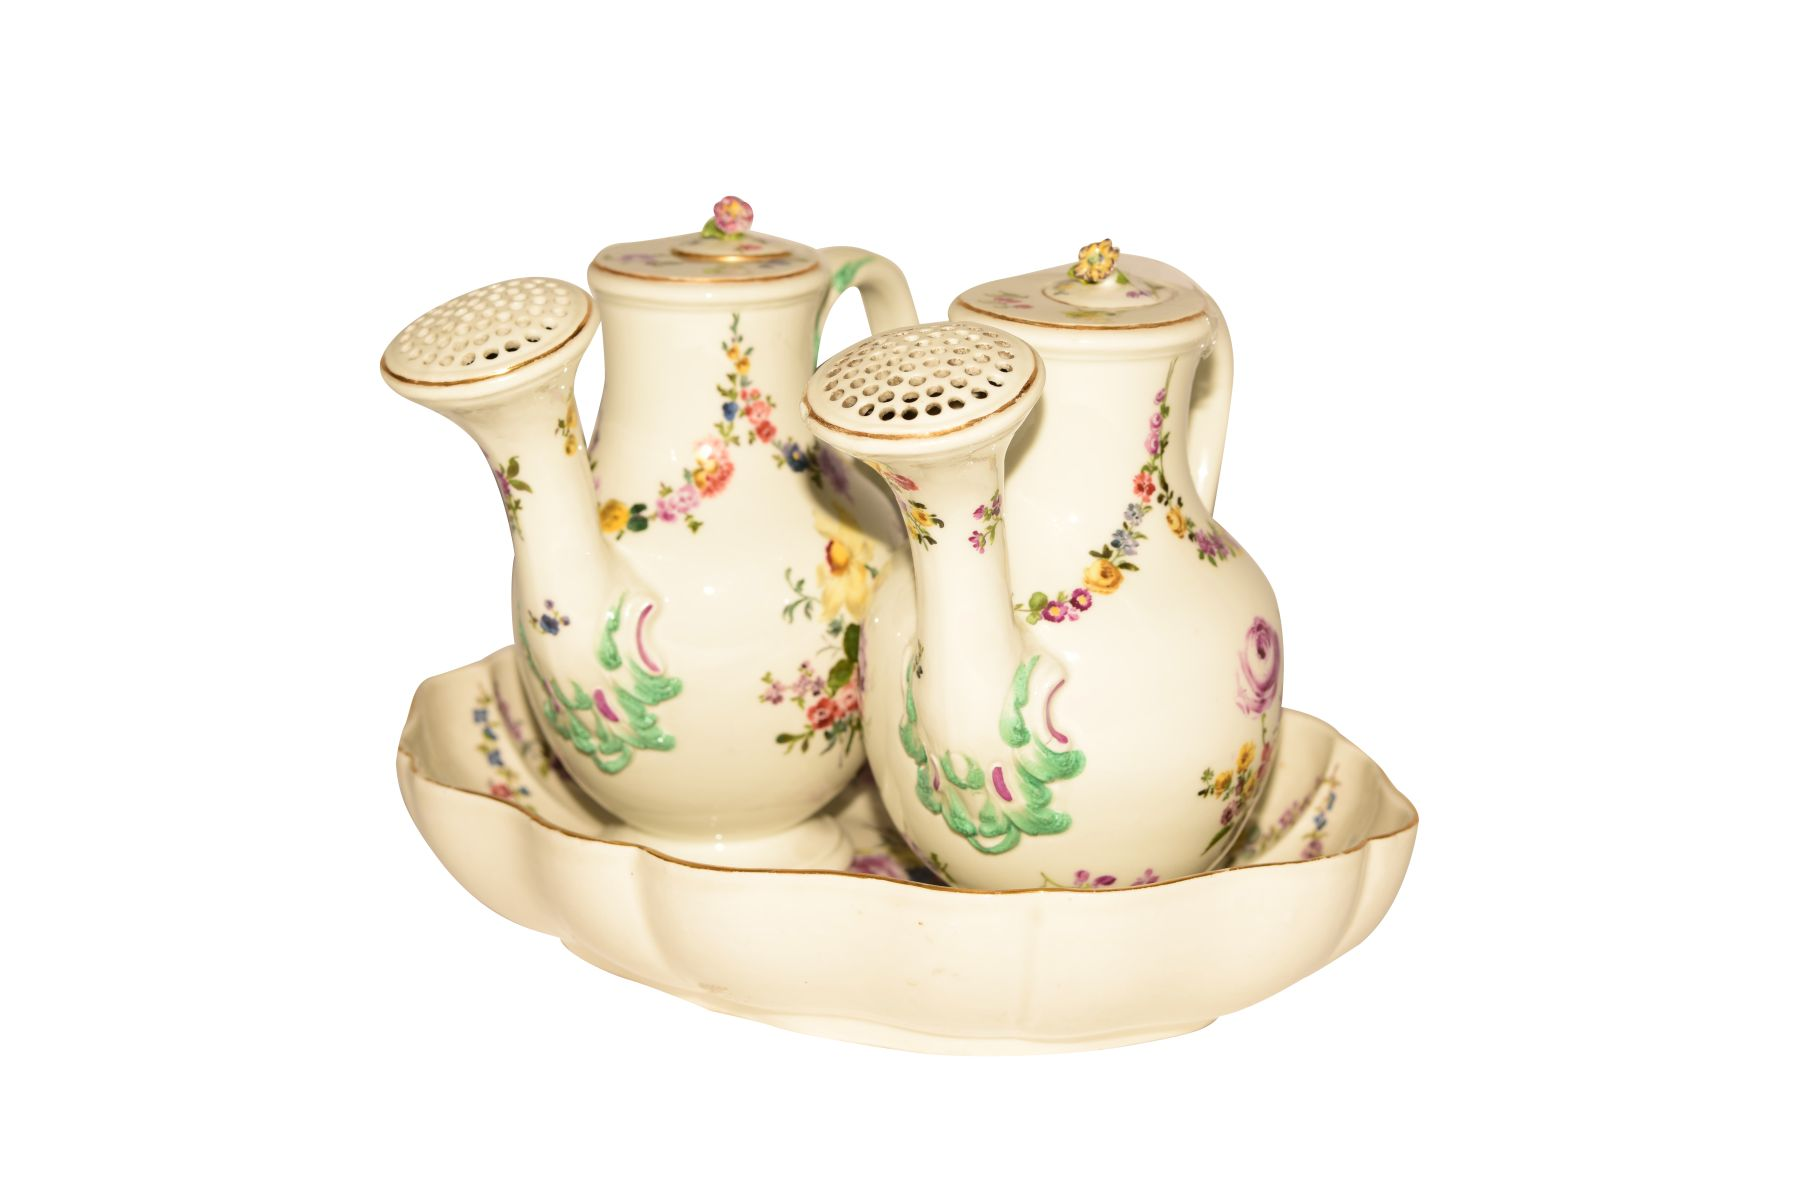 #53 Flower pots on Présentoir Meissen 1730 | Blumenkannen auf Présentoir Meissen 1730 Image